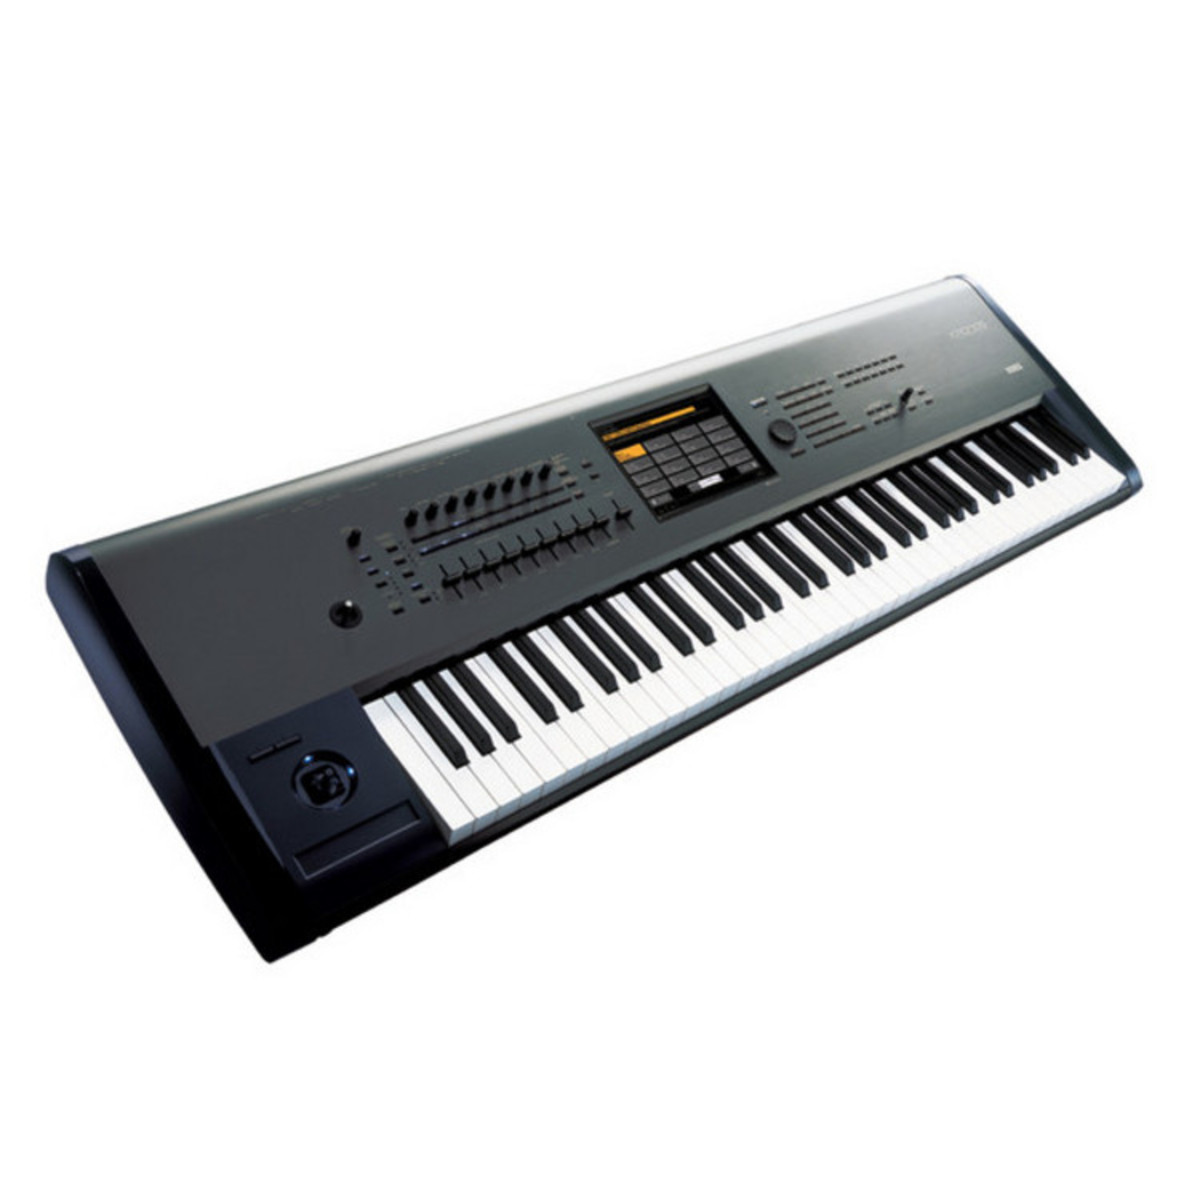 DISC KORG KRONOS 73 Key Music Workstation